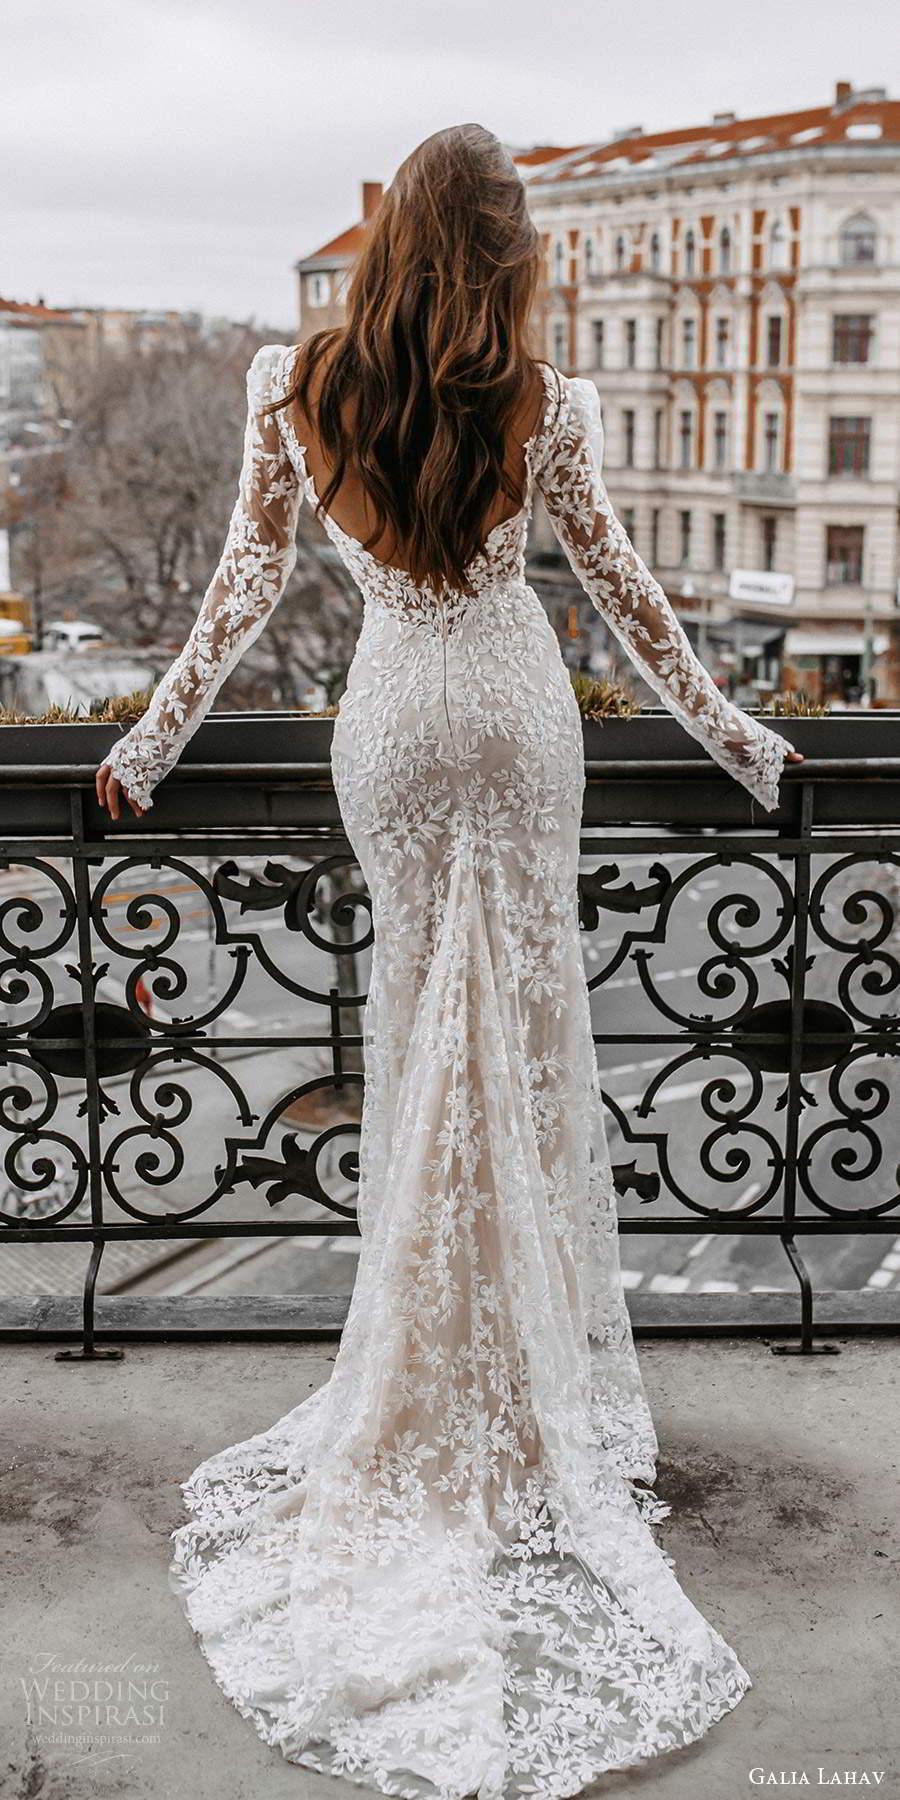 galia lahav spring 2022 gala bridal long sleeve v neckline fully embellished lace sheath wedding dress chapel train low back (1) bv